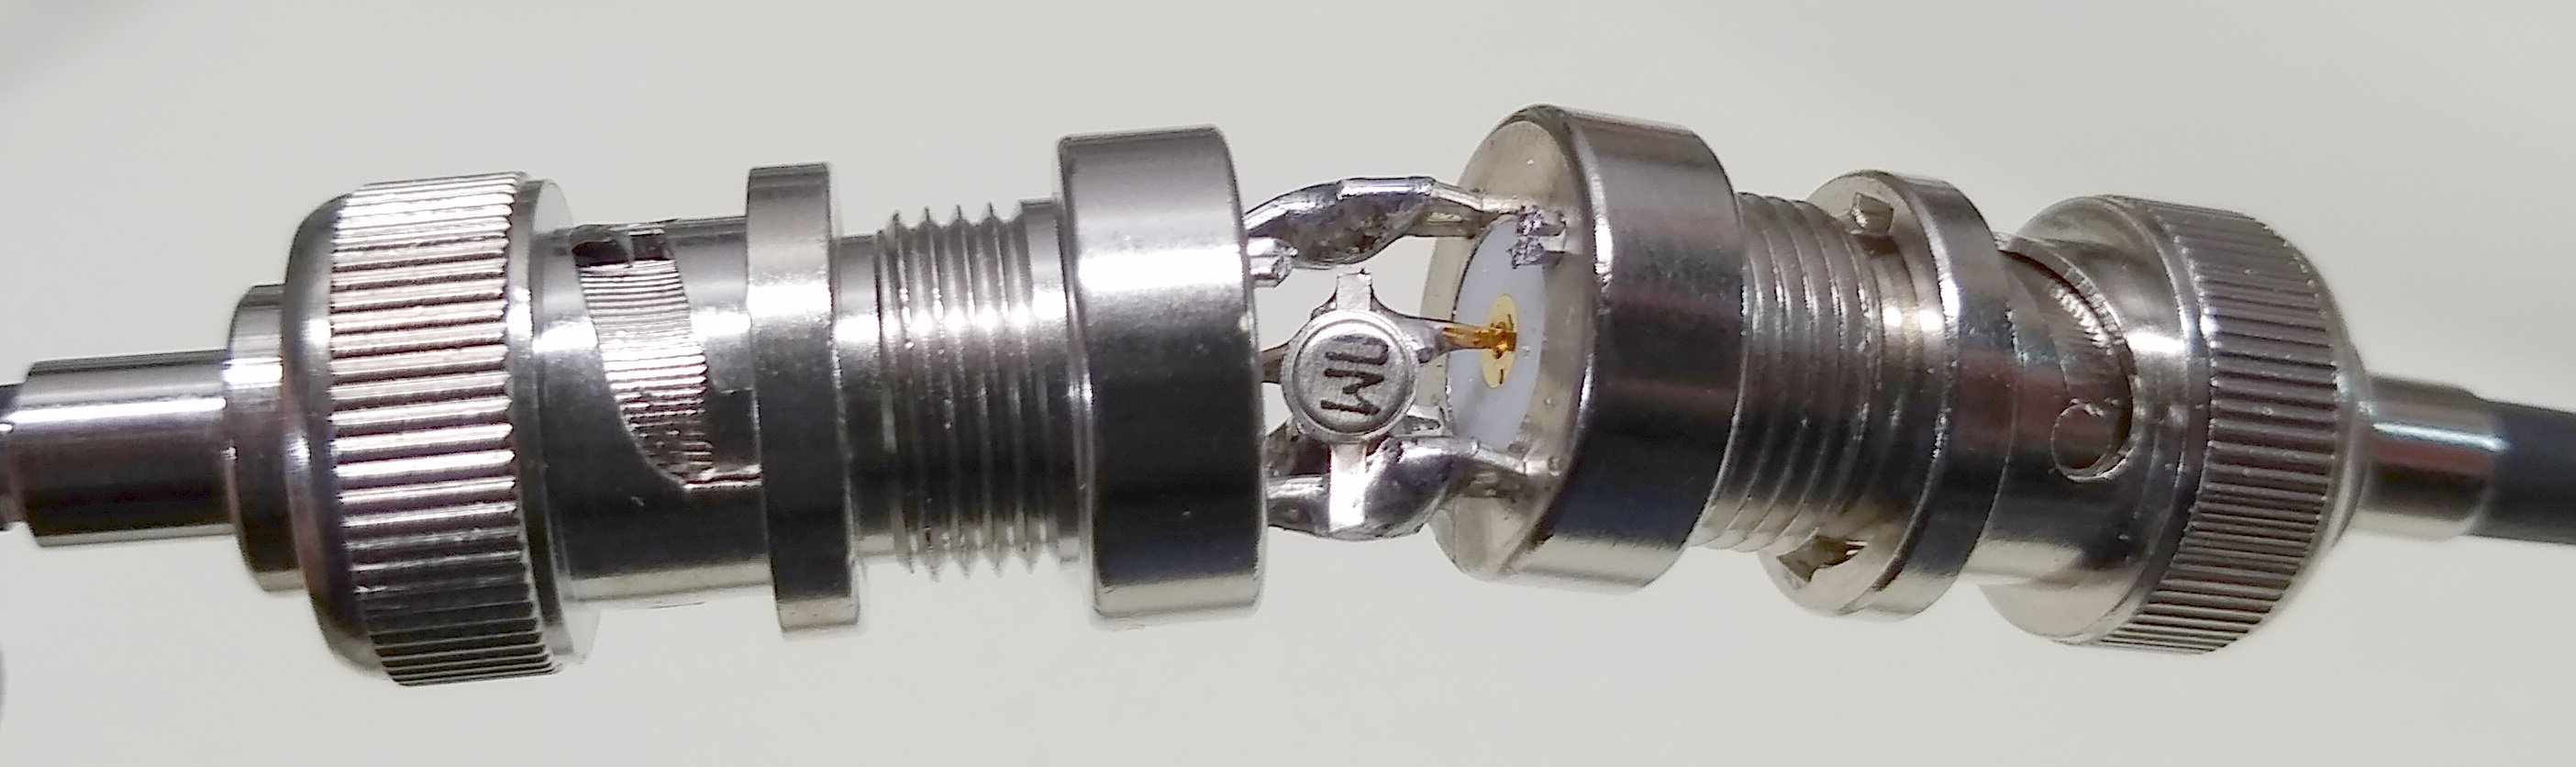 Clearance Back To Search Resultshome Zeepin Car Auto Hand Held Vacuum Pistol Pump Tester Kit 2 In 1 Brake Fluid Bleeder Adaptor Fluid Reservoir Tester Kit Handsome Appearance